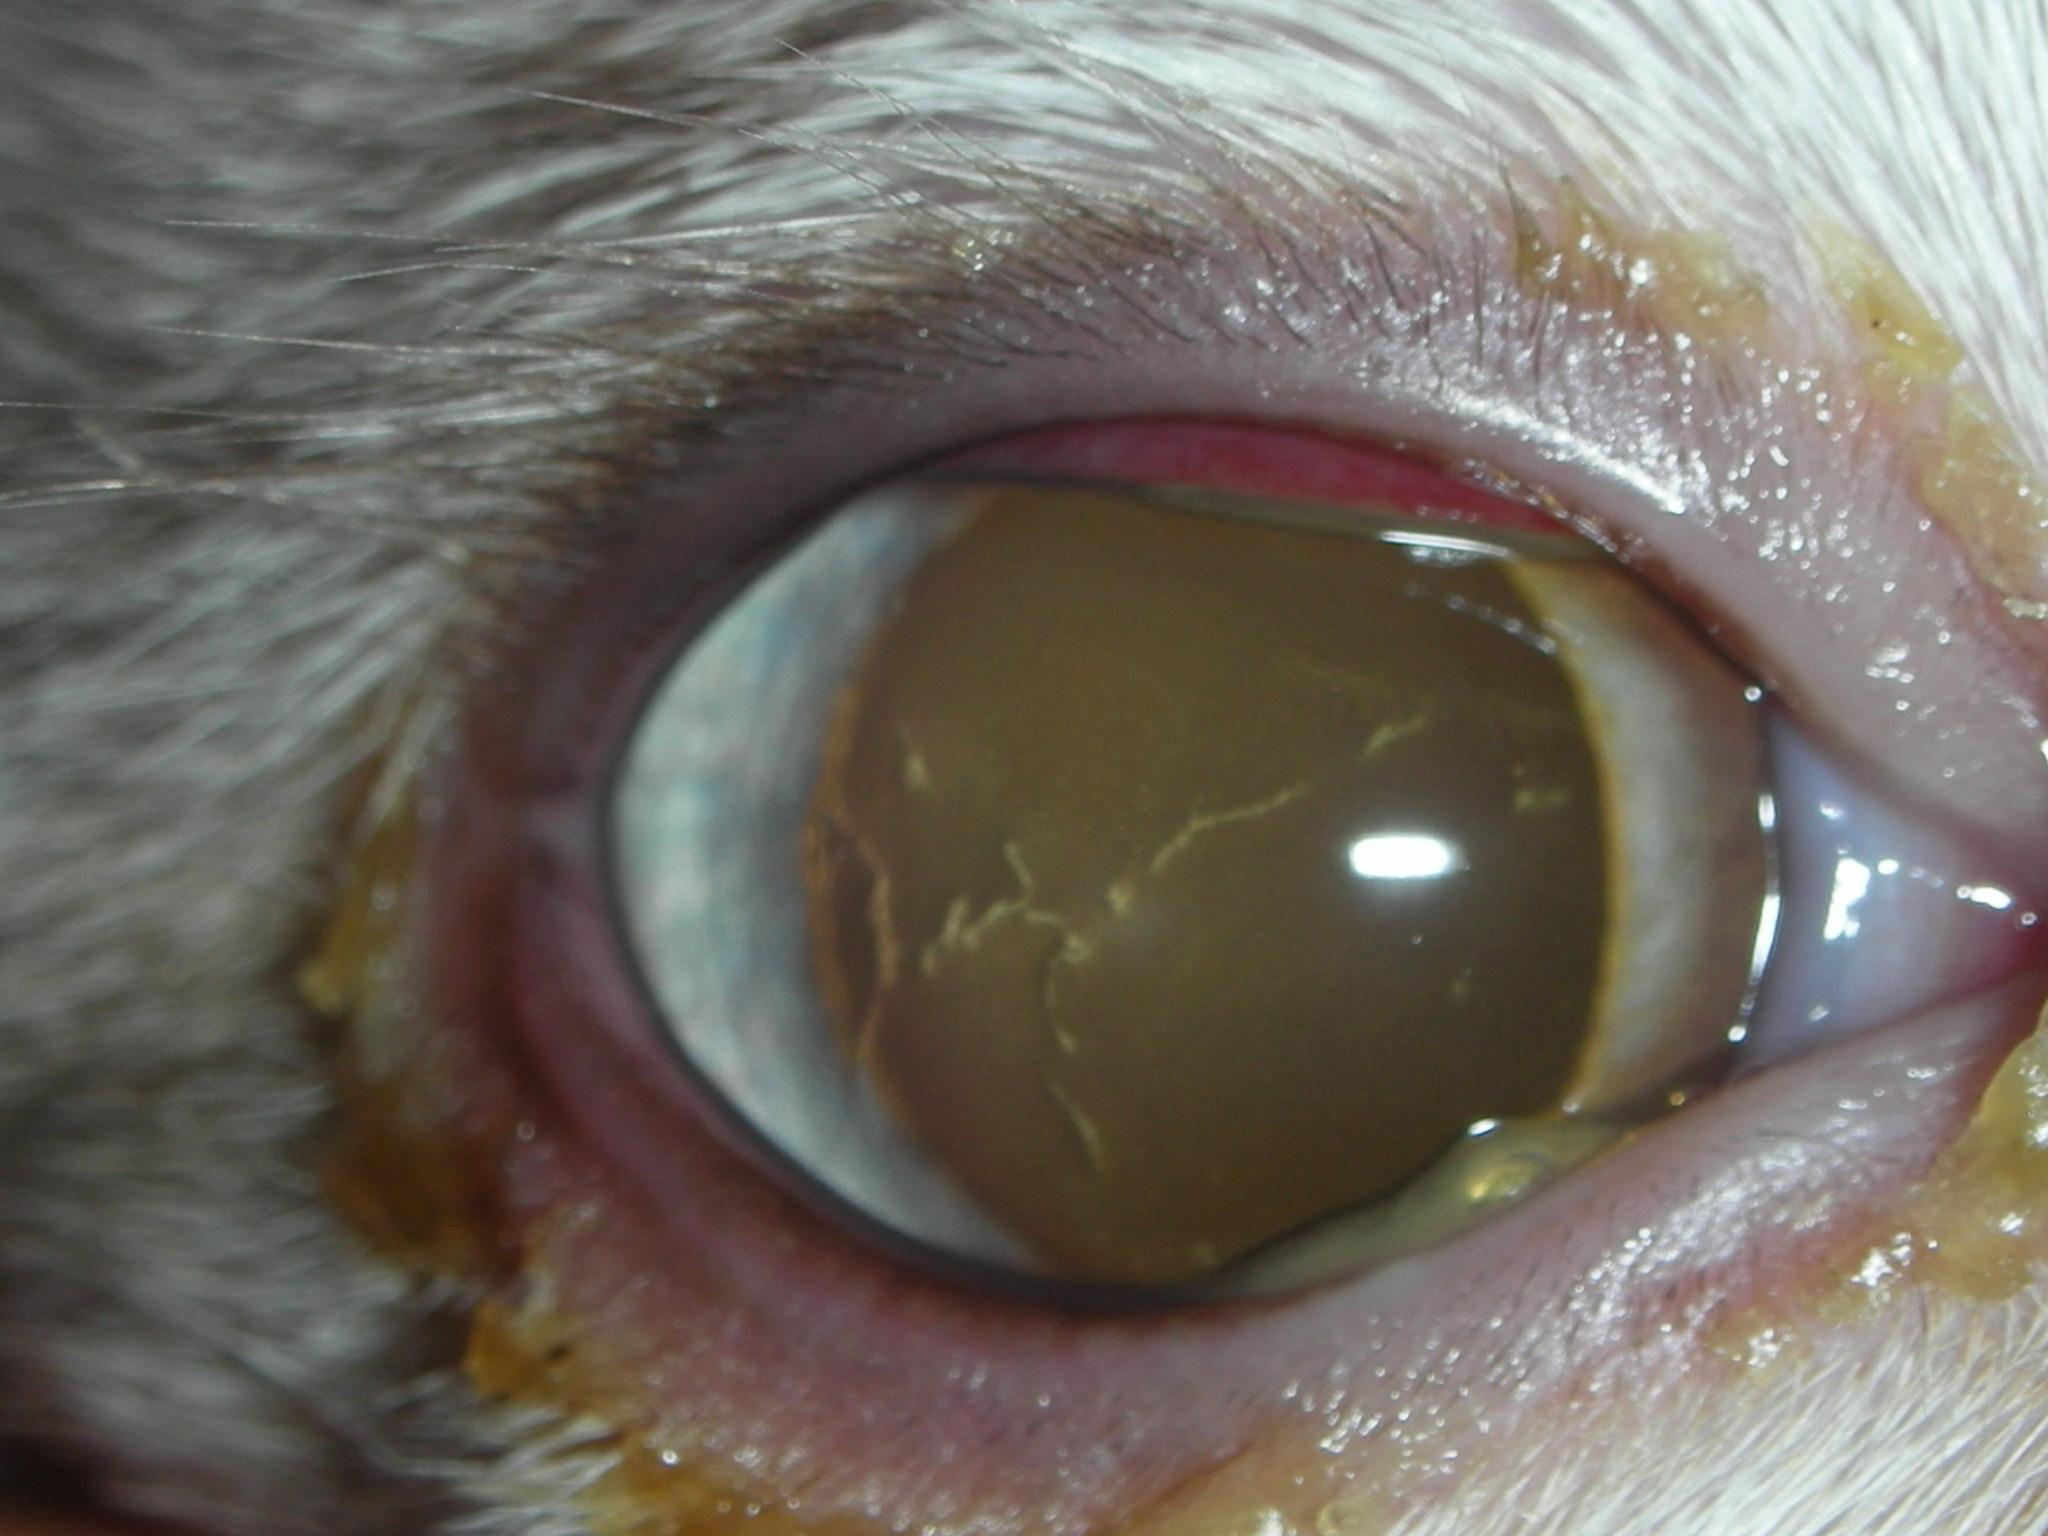 Herpetic Ulcer